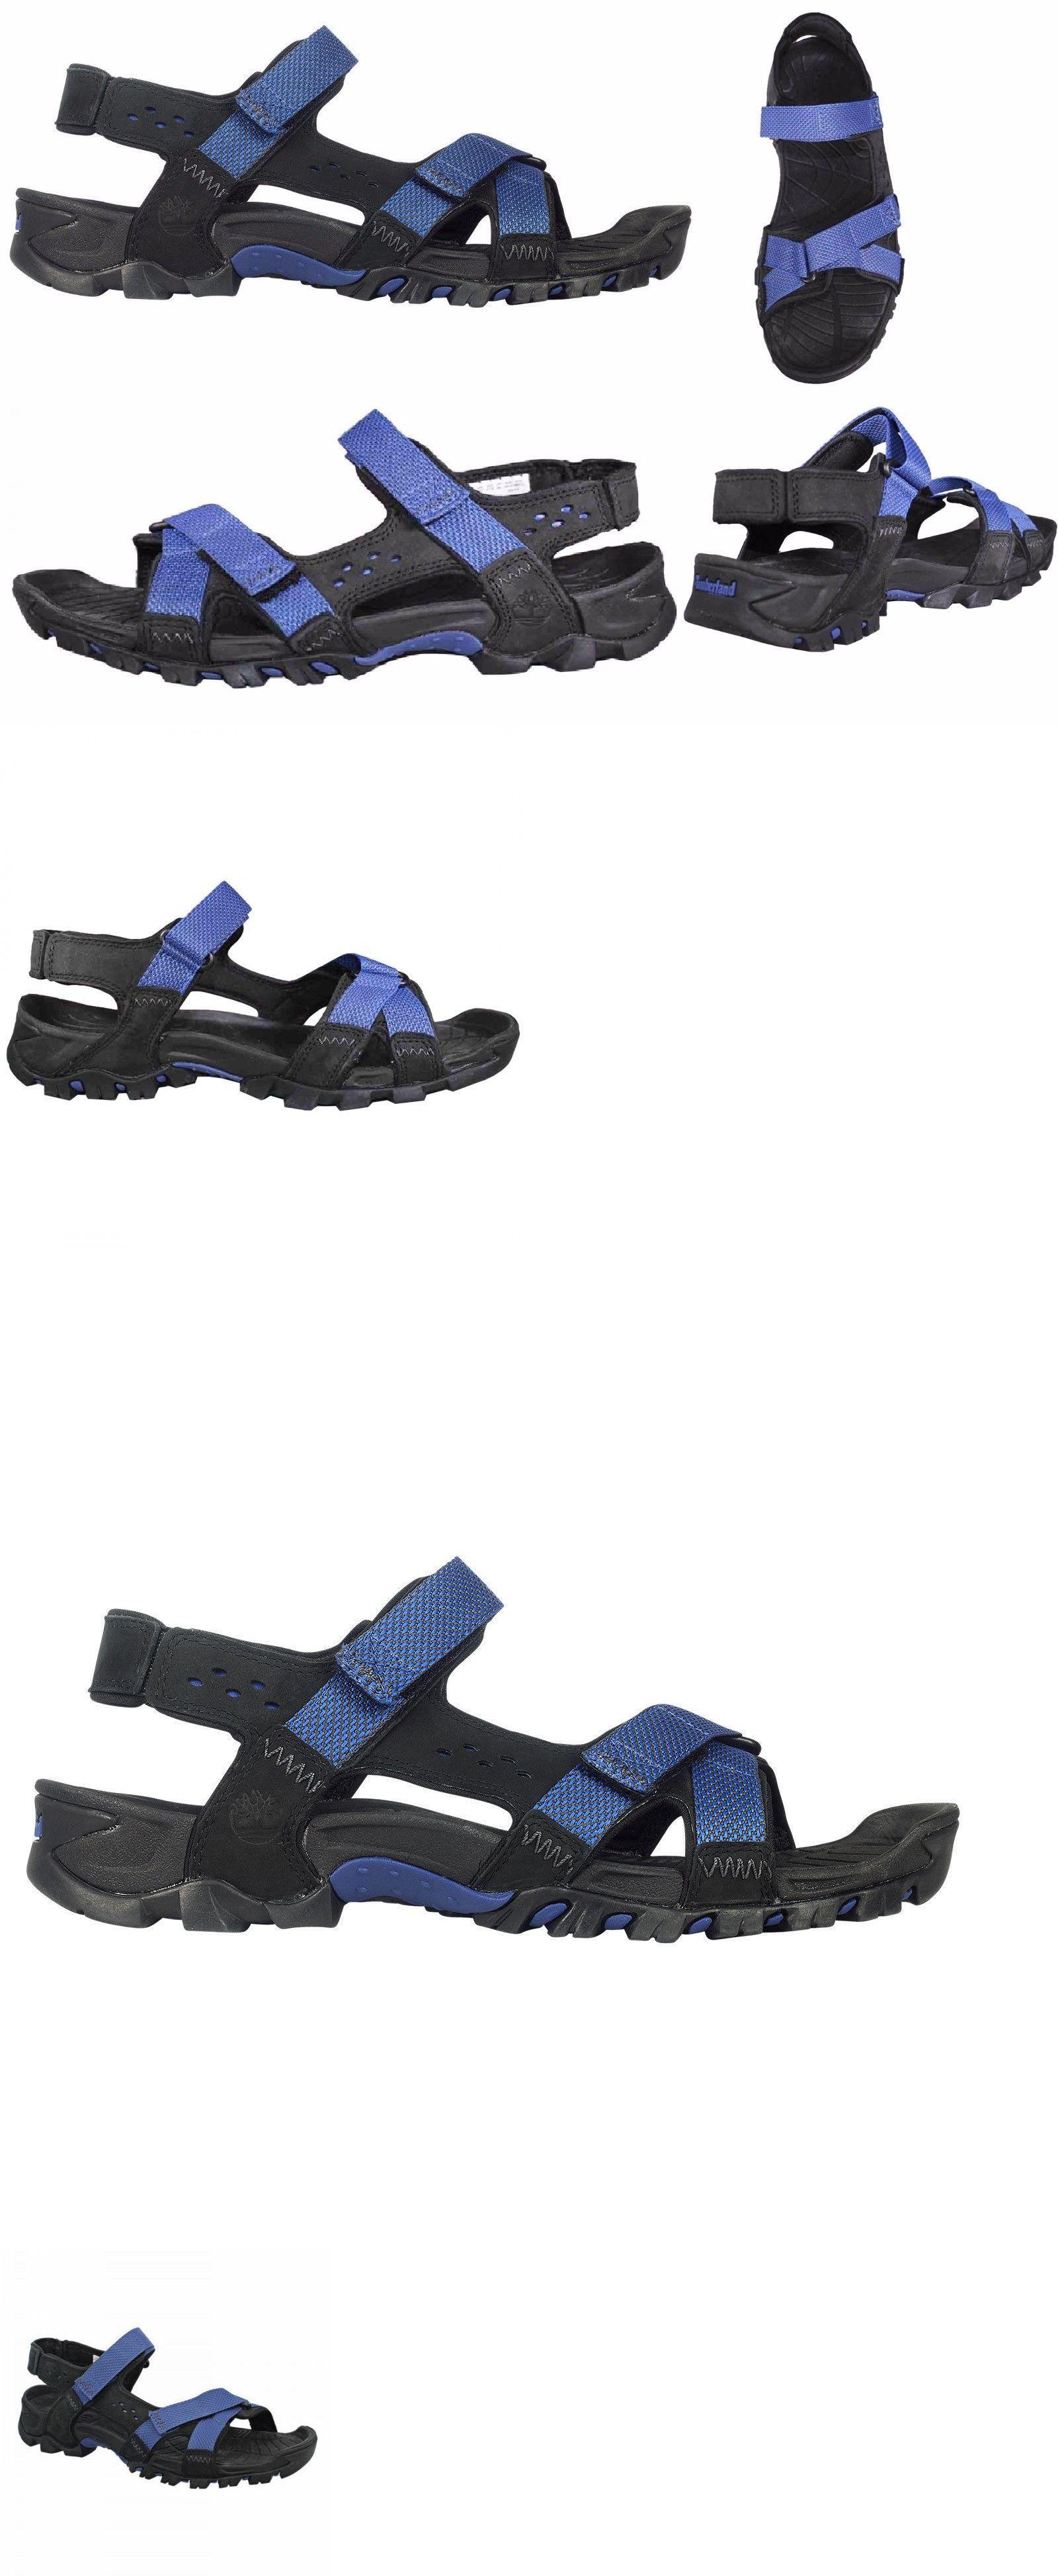 964f822732c3 Sandals and Flip Flops 11504  Timberland Men S Eldridge Leather Blue Sport  Sandals Flip Flop 5825A -  BUY IT NOW ONLY   40.19 on eBay!